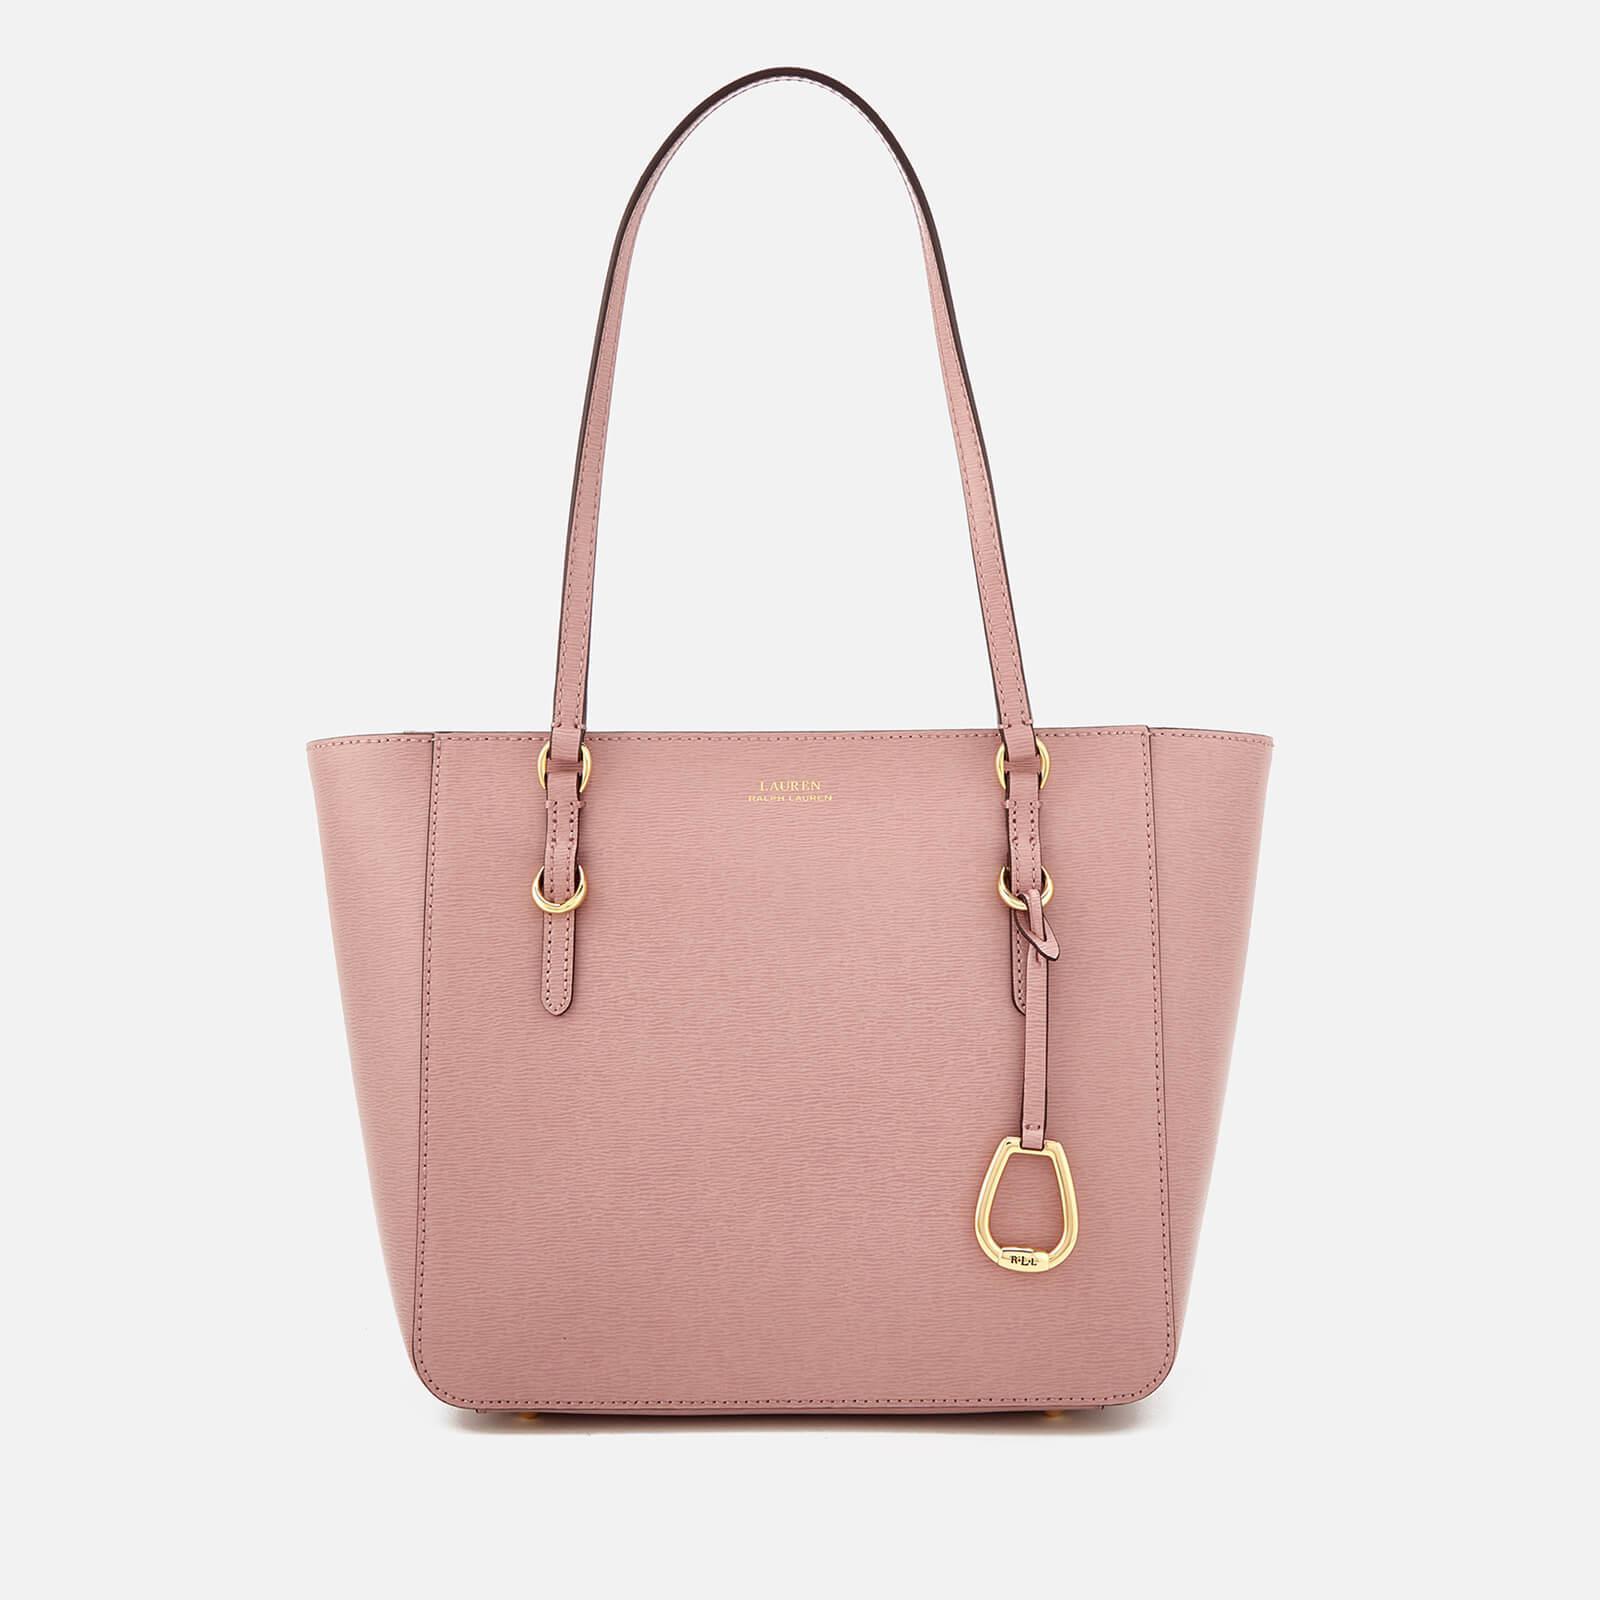 fb1589fb4f Lauren by Ralph Lauren Bennington Shopper Bag in Pink - Lyst